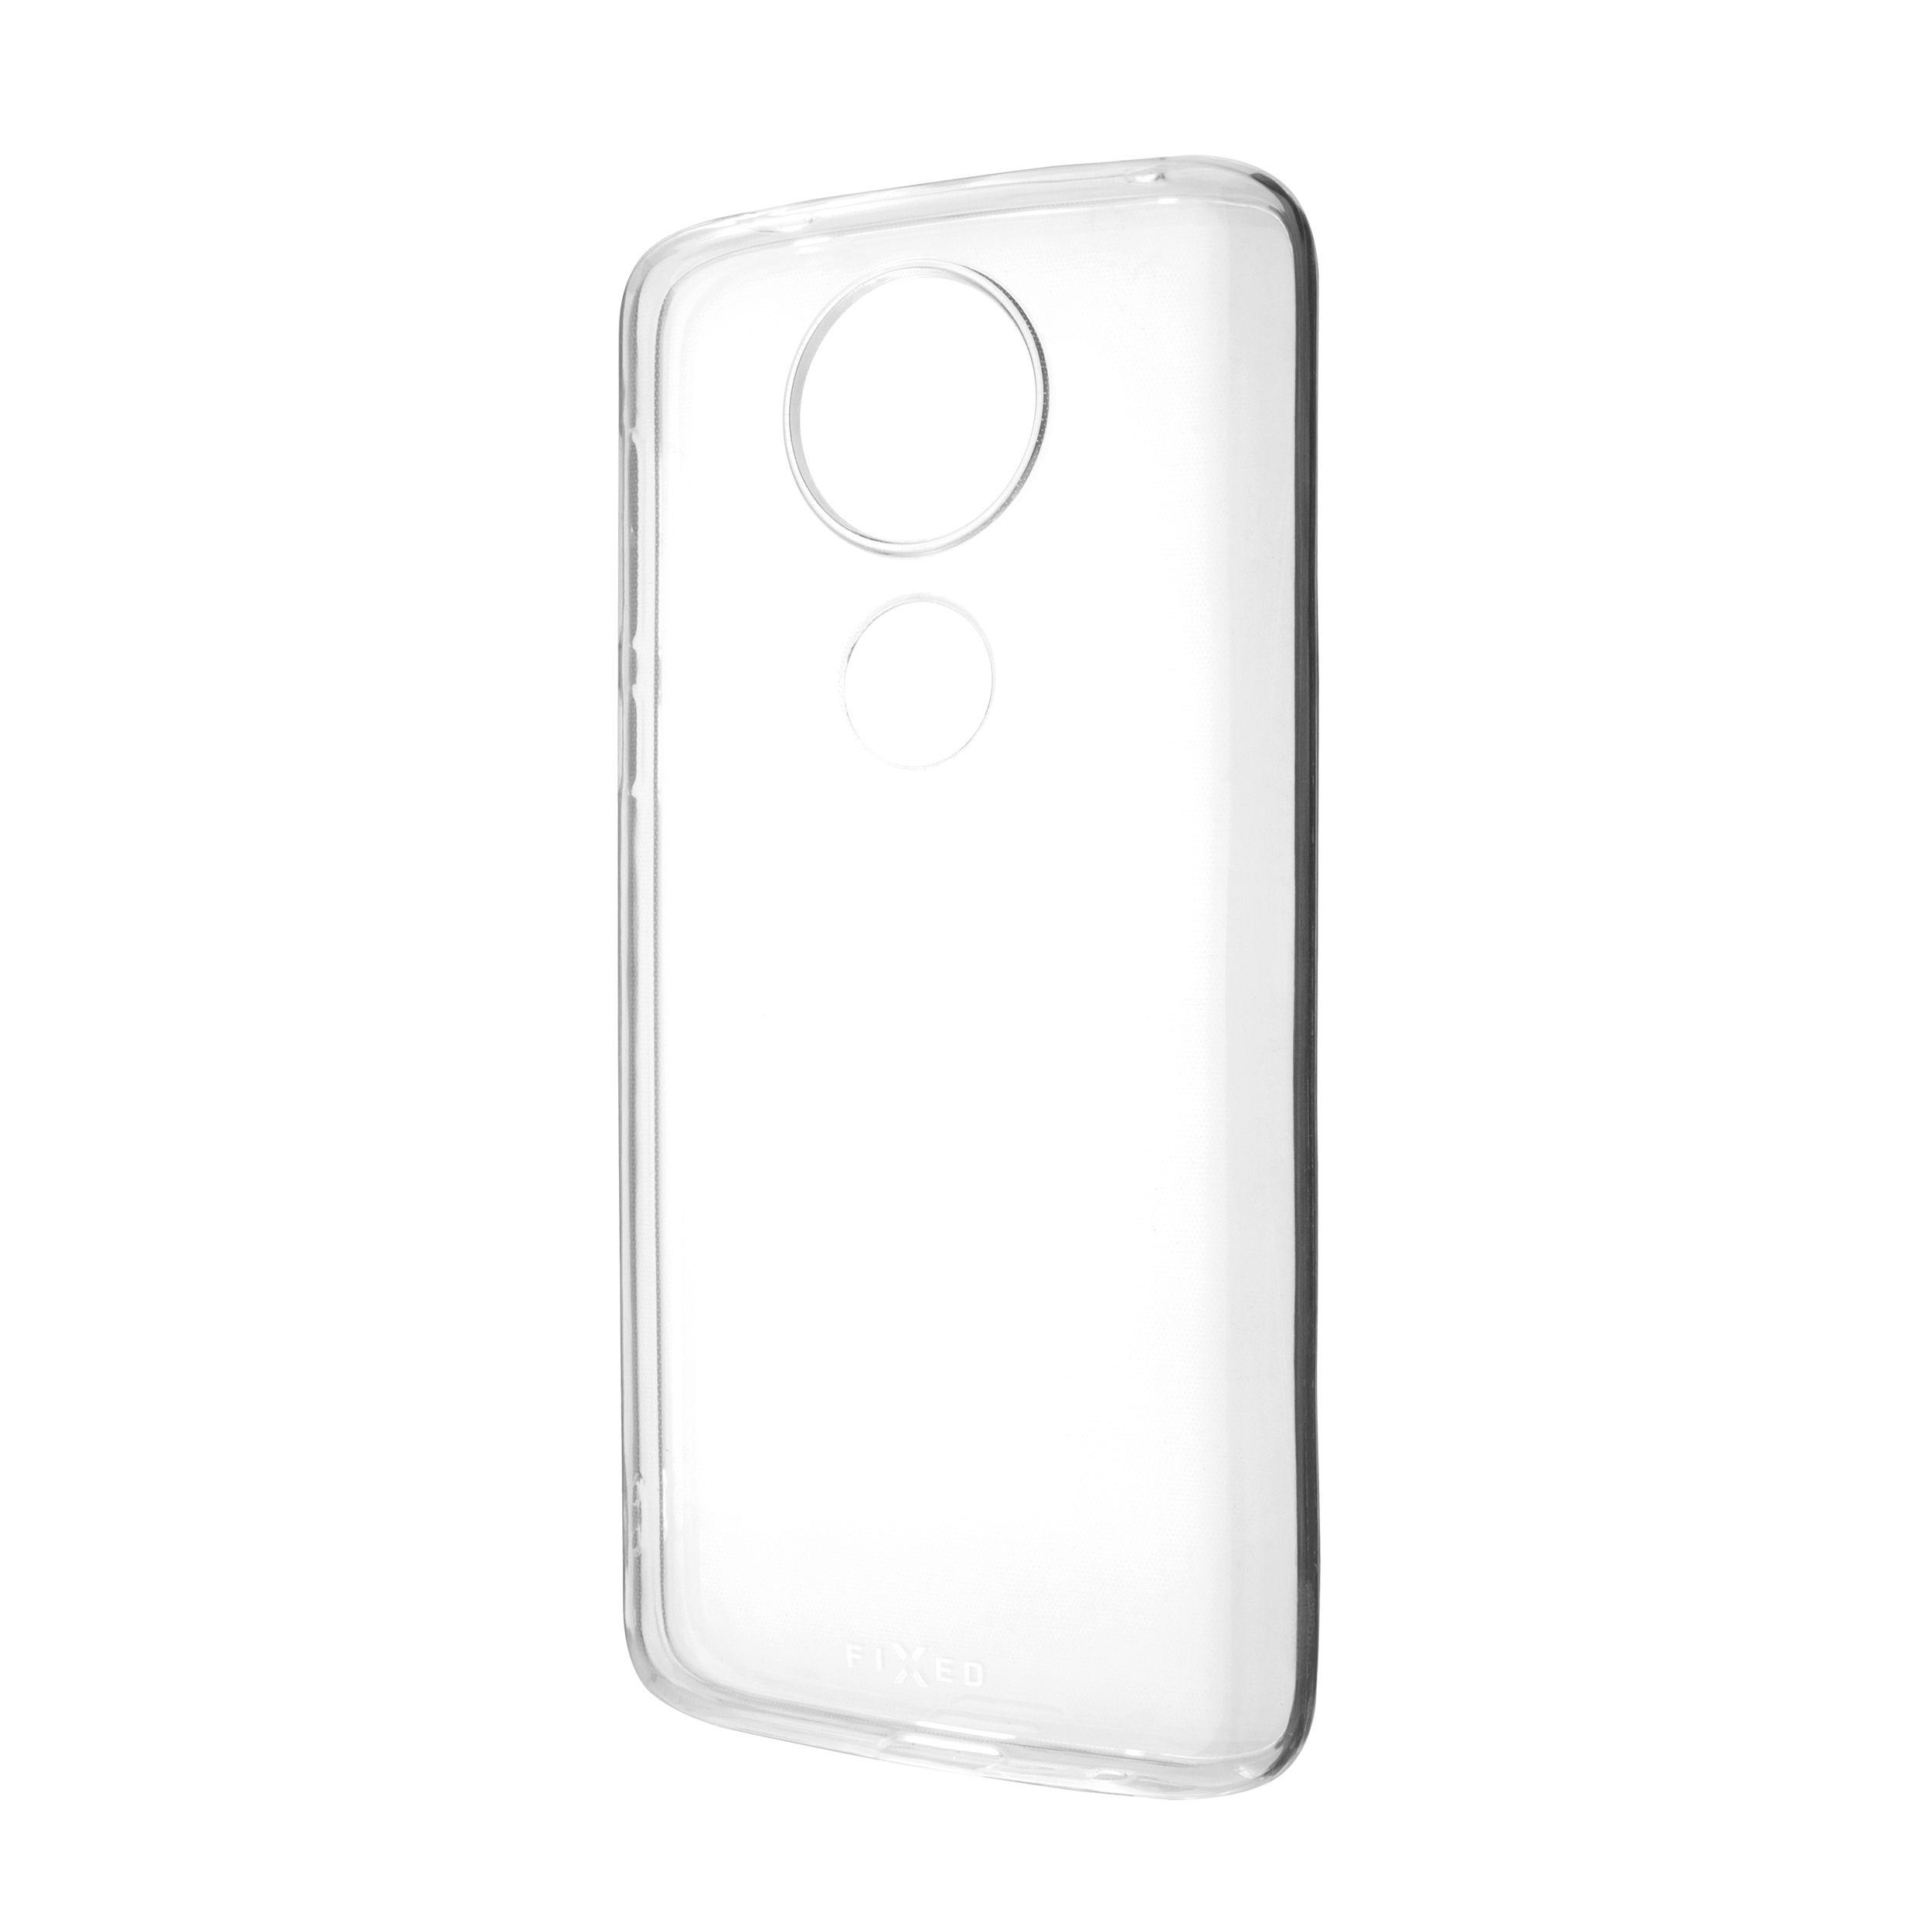 TPU gelové pouzdro FIXED pro Motorola Moto E5 Plus, čiré